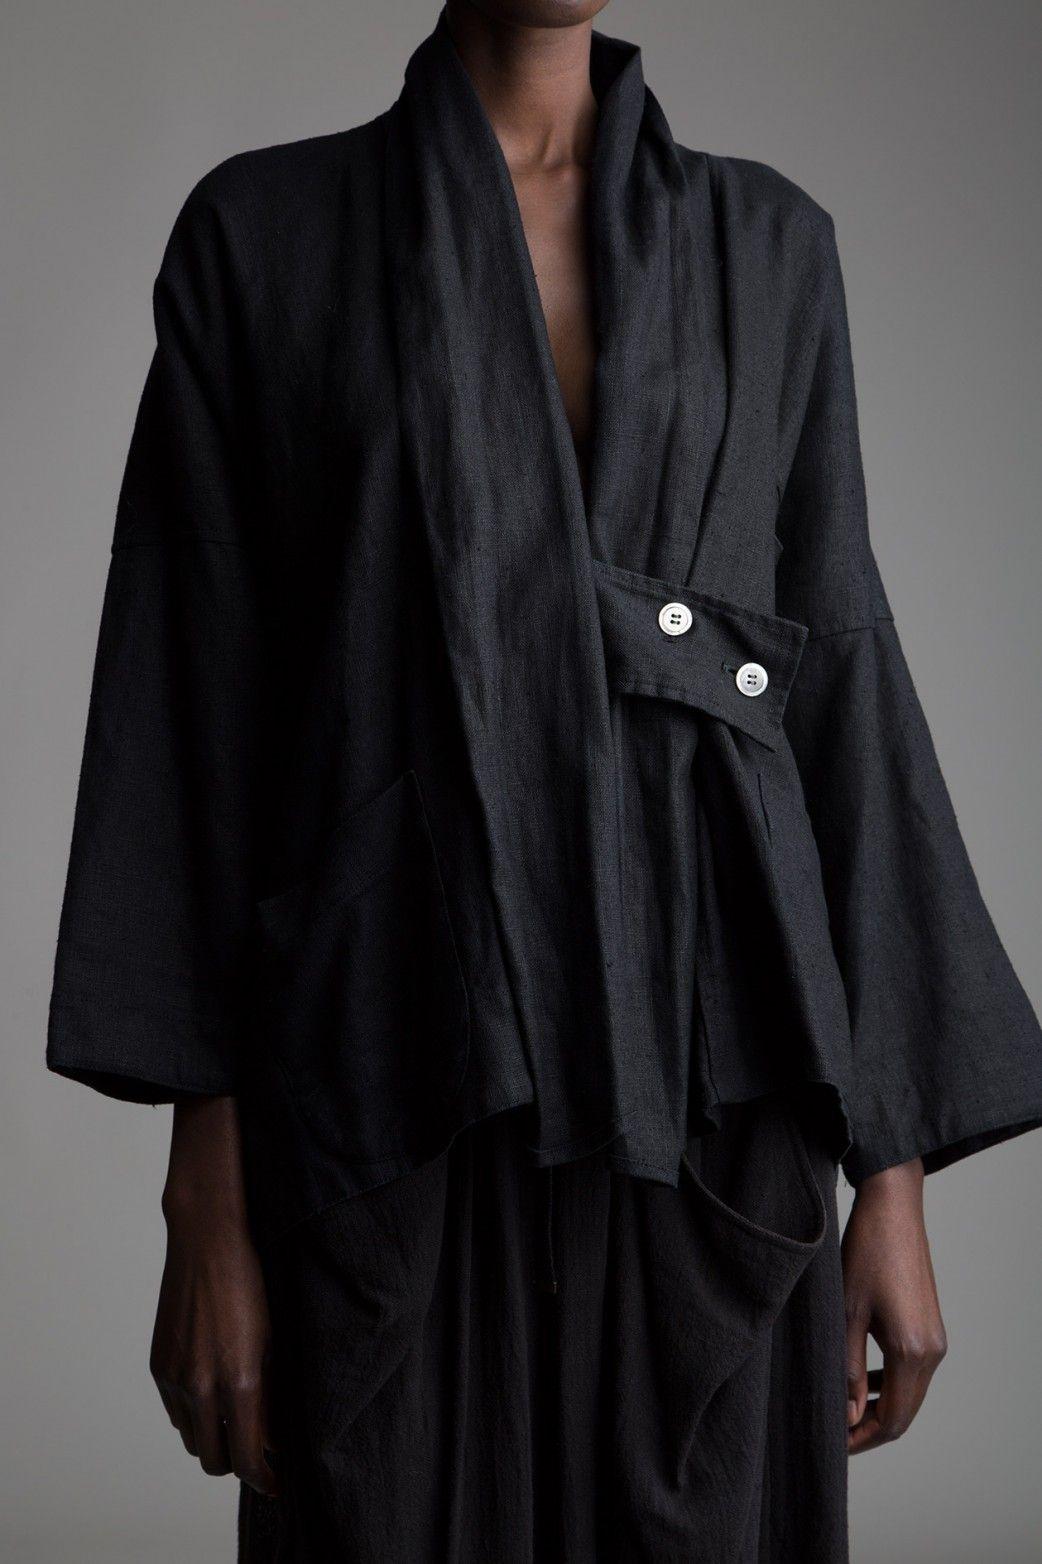 179ce9078ba5 Vintage Y's Yohji Yamamoto Linen Jacket Designer Vintage Clothing Minimal  Fashion